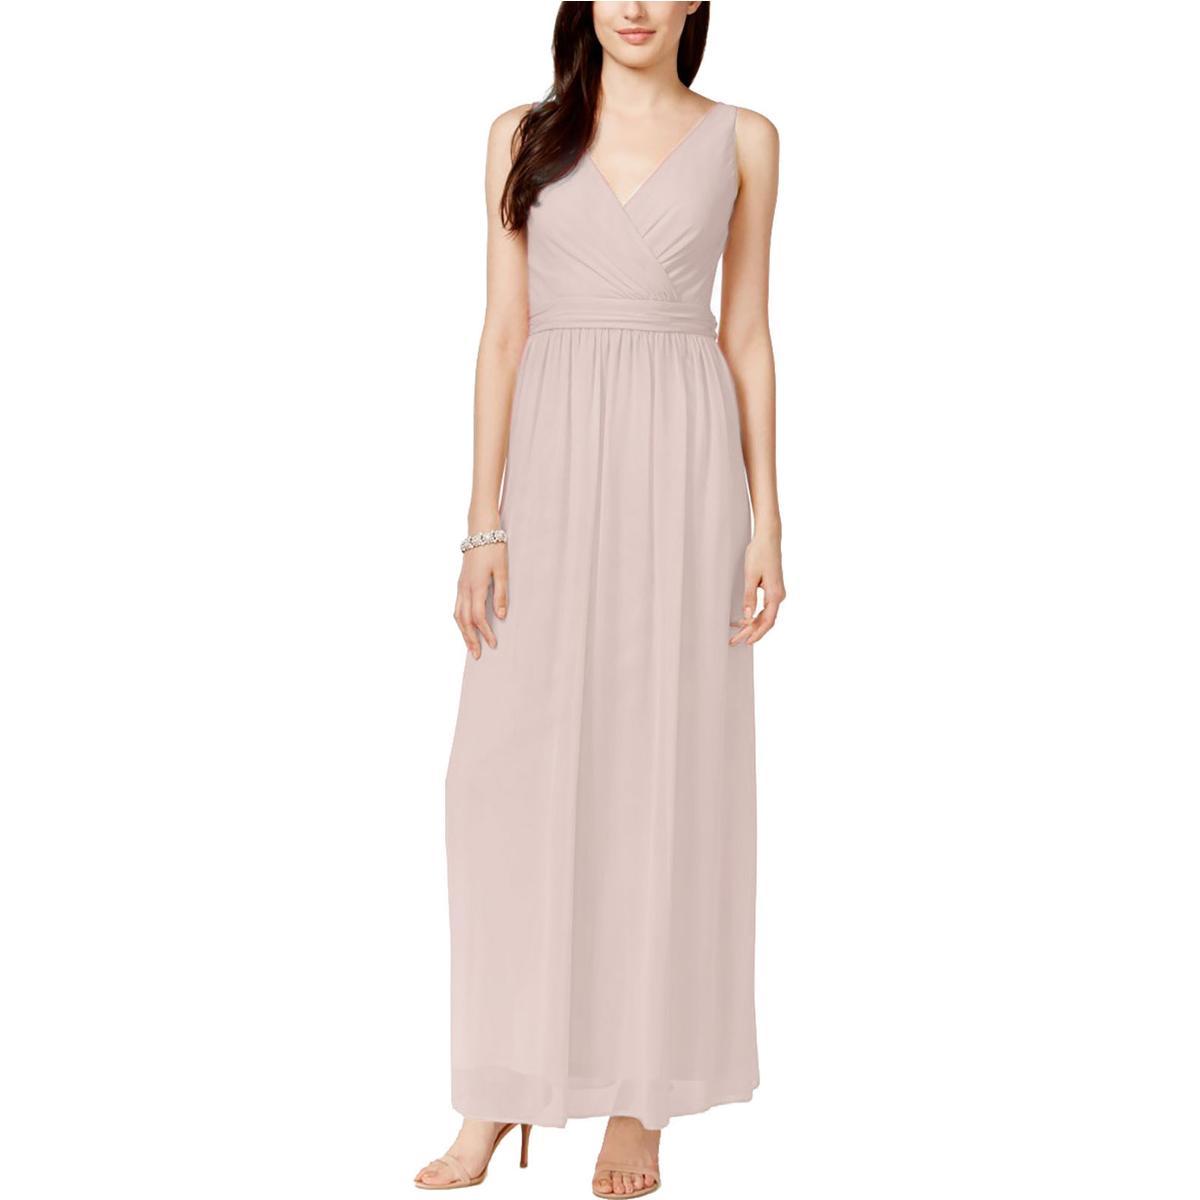 Adrianna Papell 7326 Womens Chiffon Drape Back Formal Evening Dress BHFO  eBay